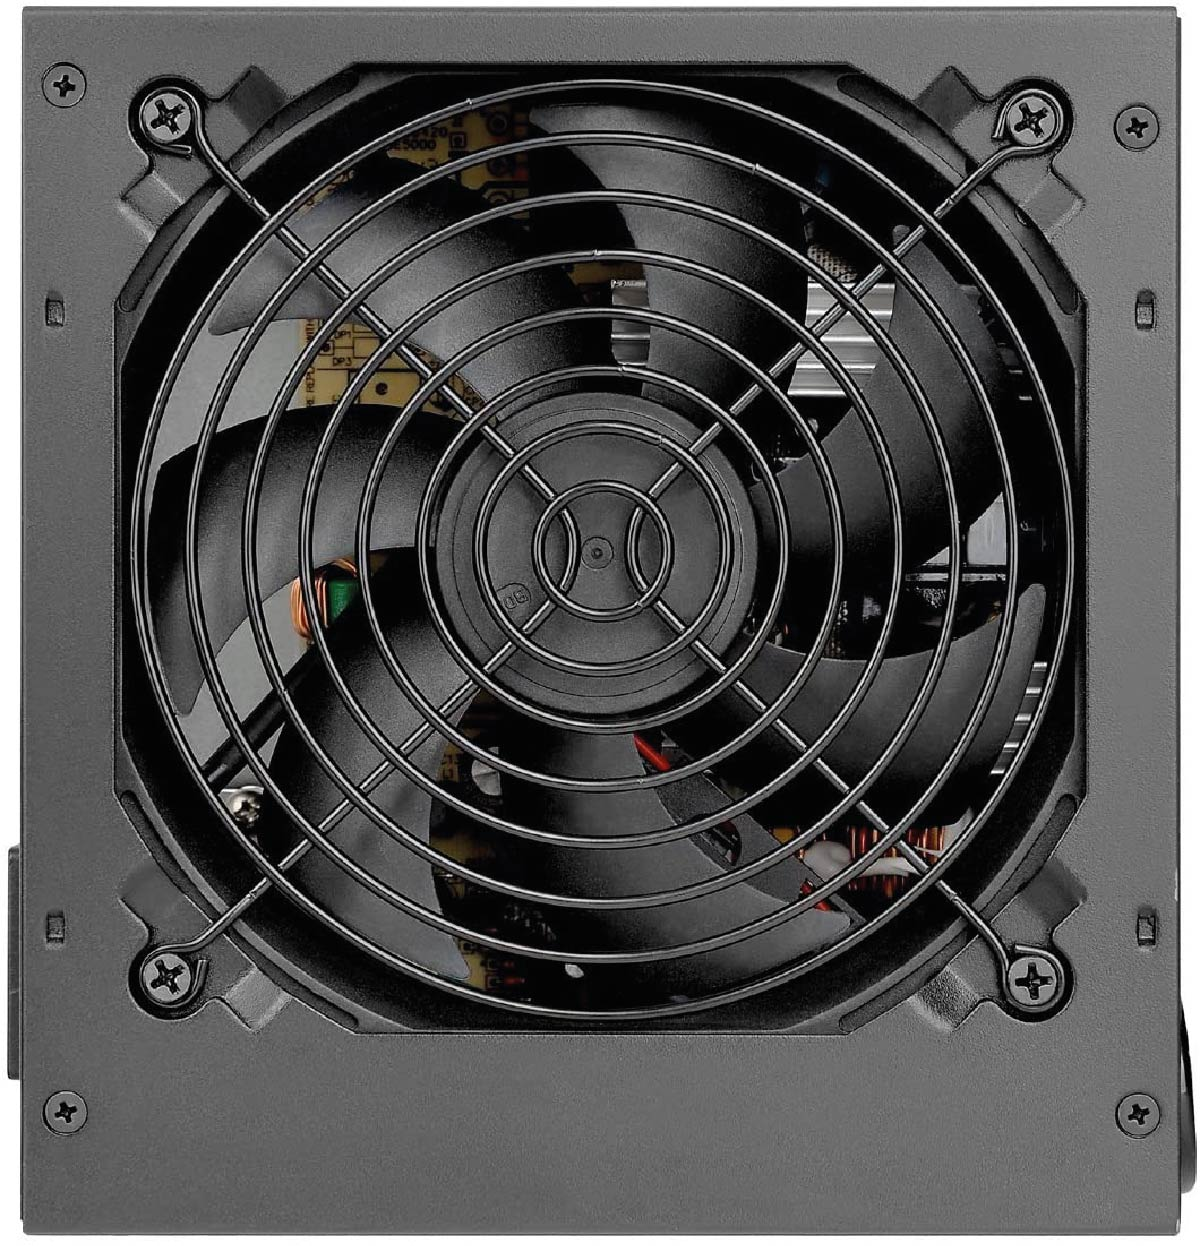 Fonte ATX 500w Thermaltake Smart Gamer 80 Plus White Certificado APFC PSU